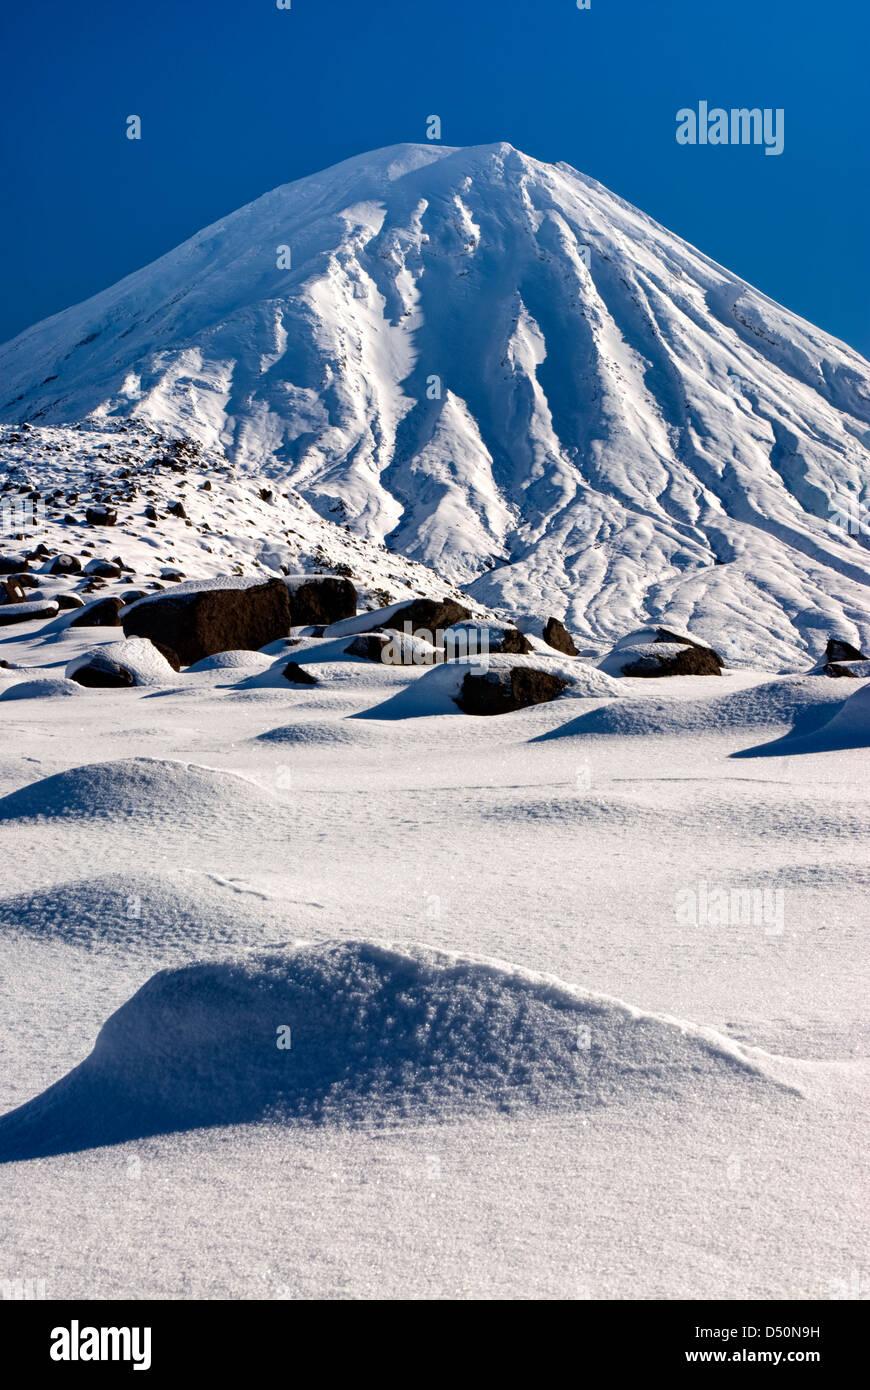 Mount Ngauruhoe, Tongariro National Park, Manawatu-Wanganui, New Zealand - Stock Image